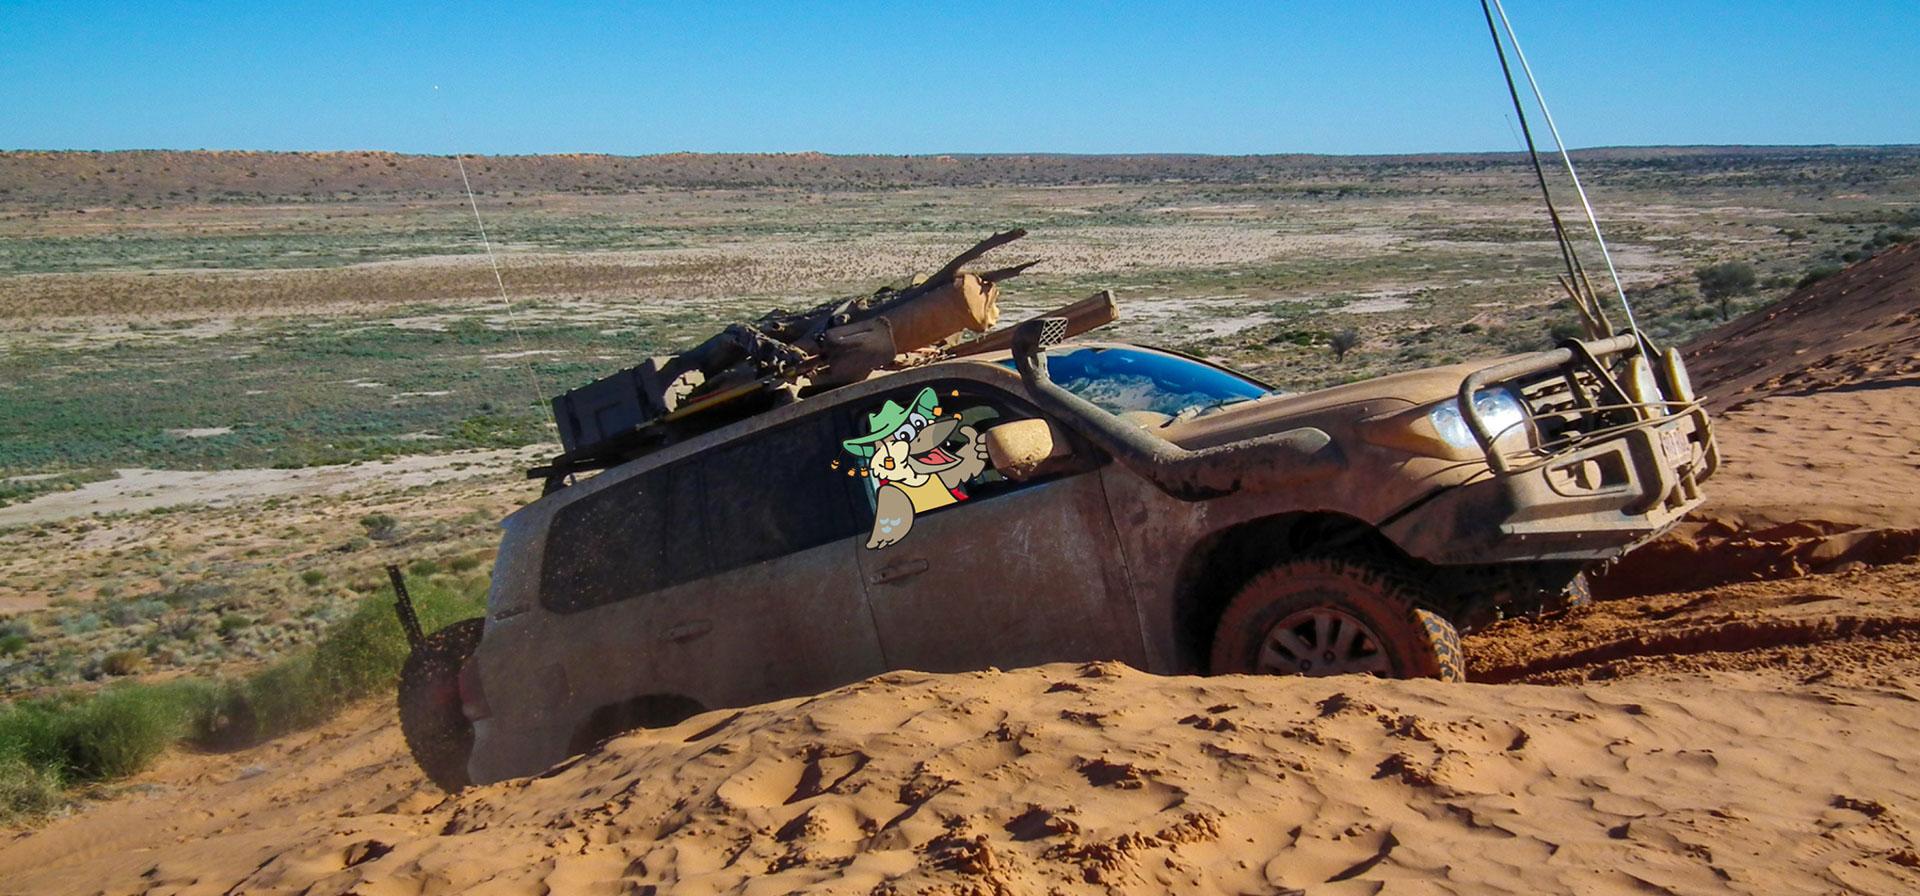 Kookaburra Tours 4WD